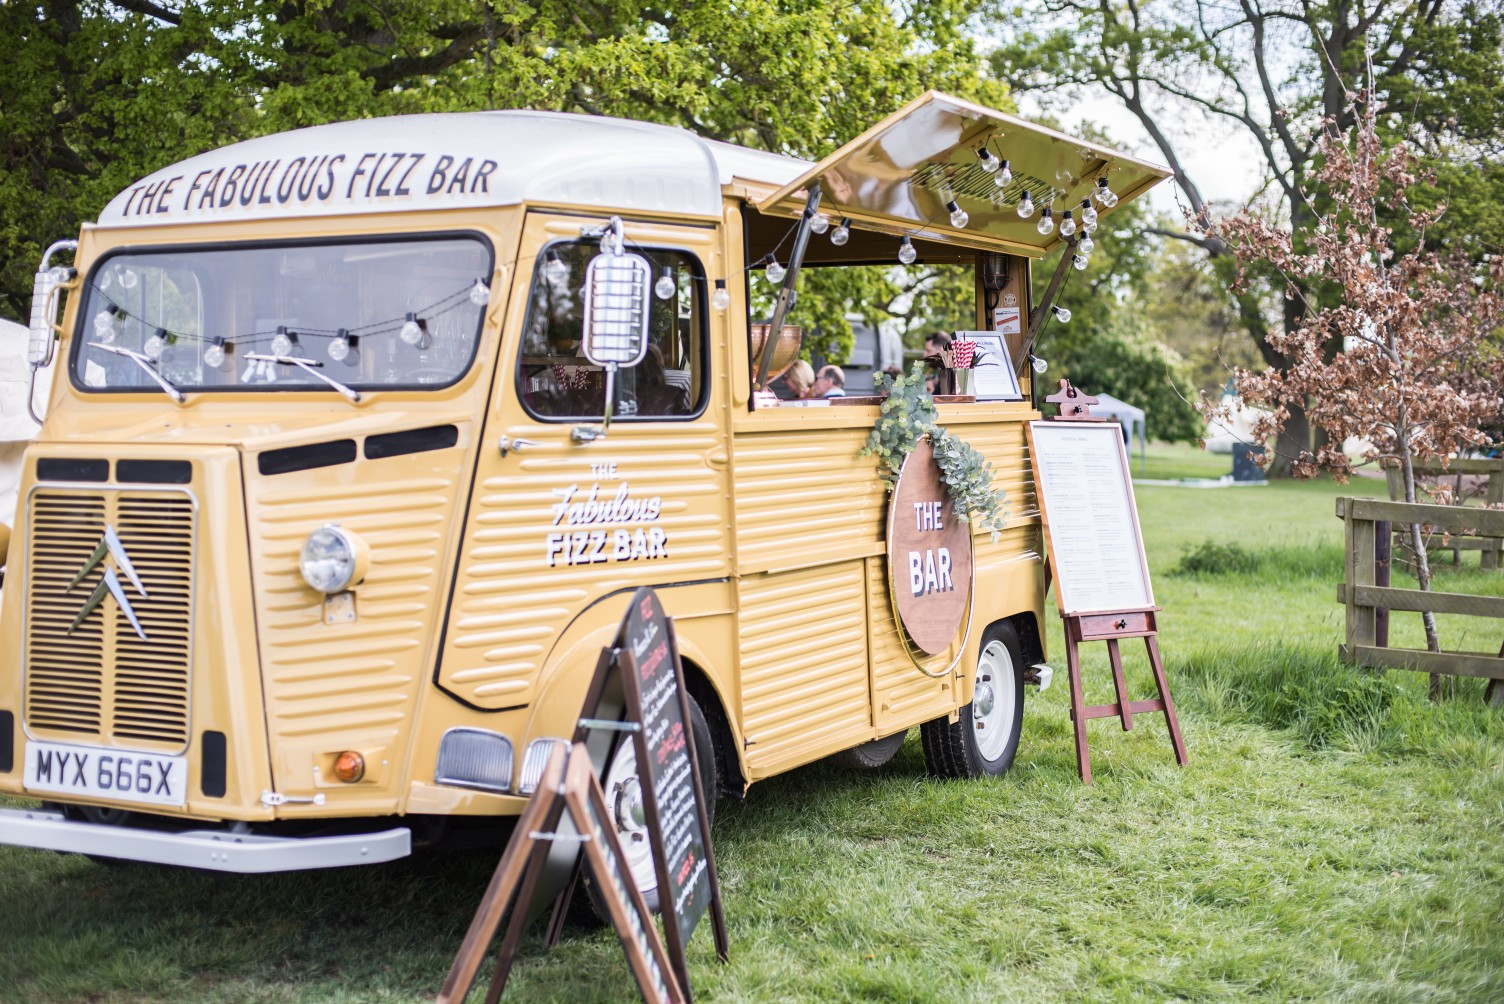 The fabulous fizz bar - how to plan a festival wedding - alternative wedding - matt glover photography - unconventional wedding festival (2)